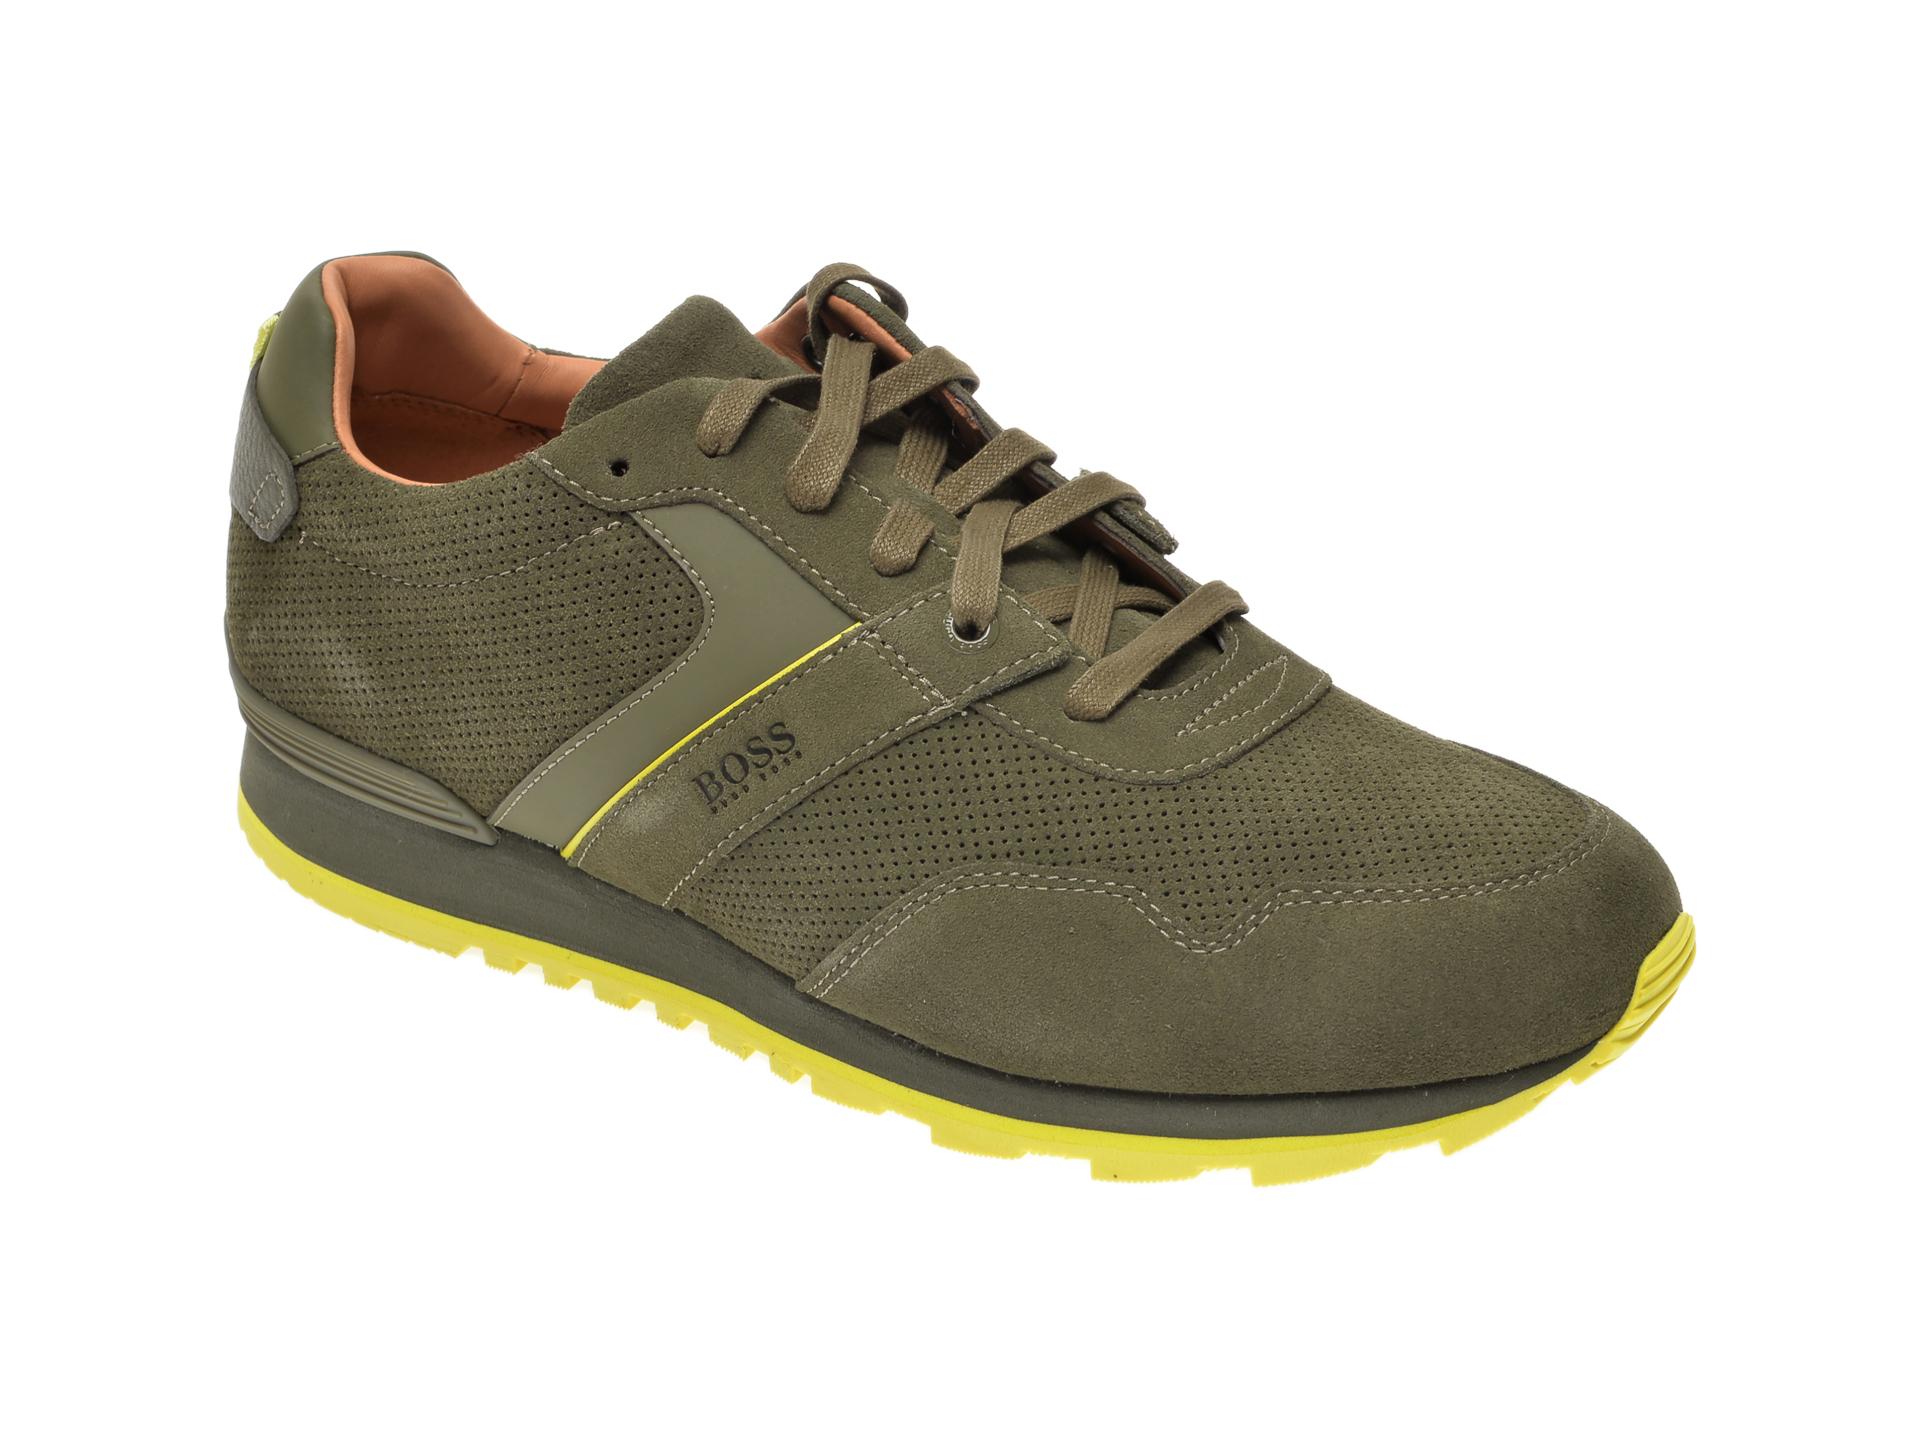 Pantofi sport HUGO BOSS kaki, 8495, din piele intoarsa imagine